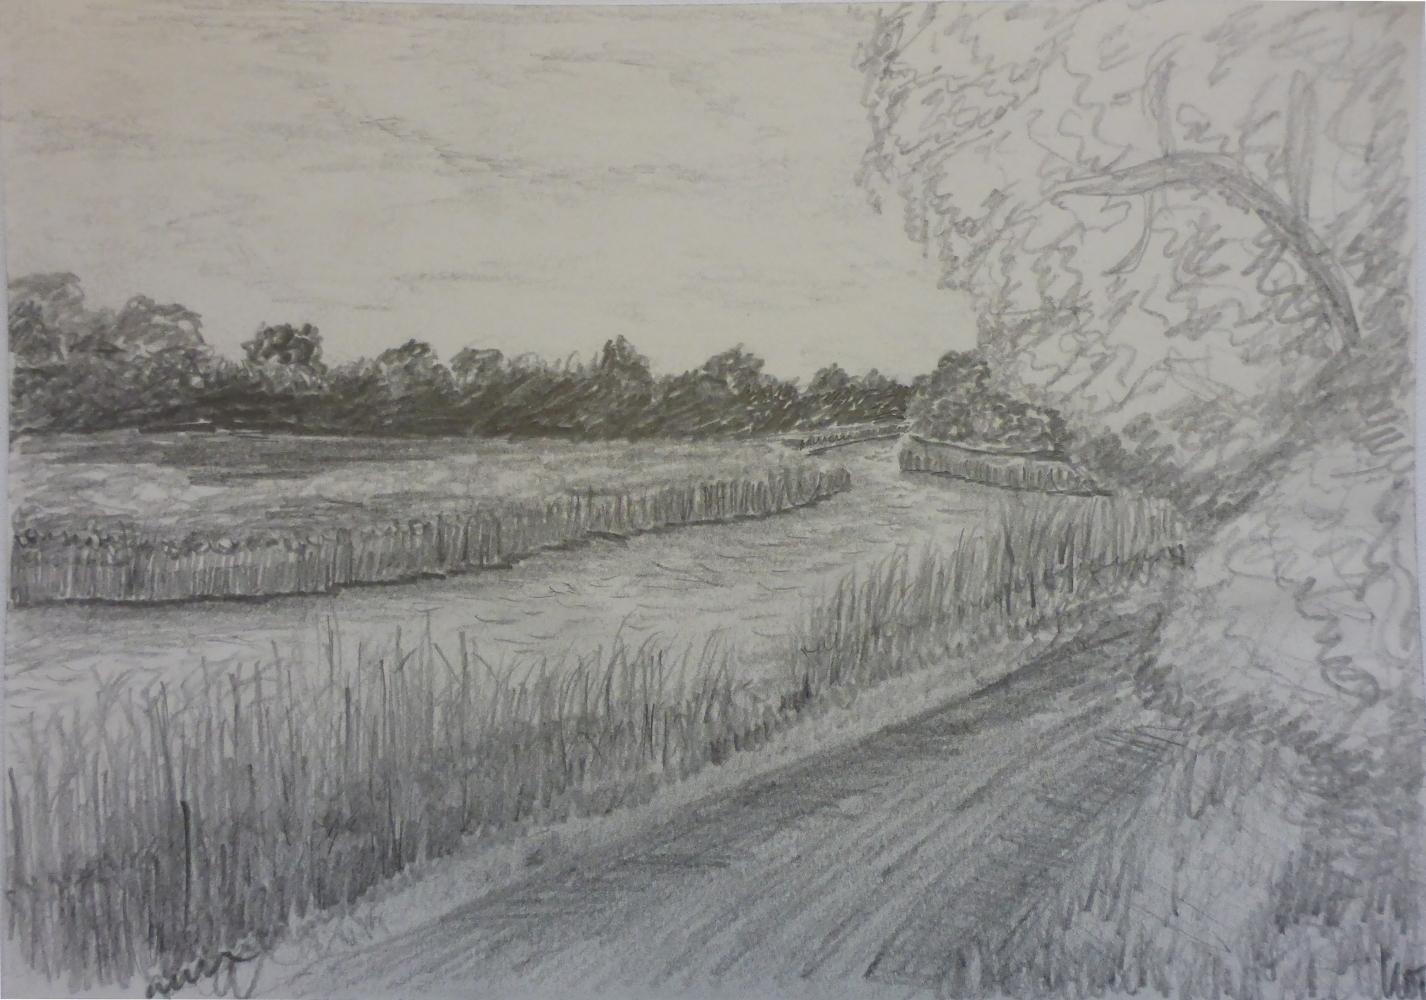 """Ryck I"", 2018, pencil on paper, 30 x 21 cm"